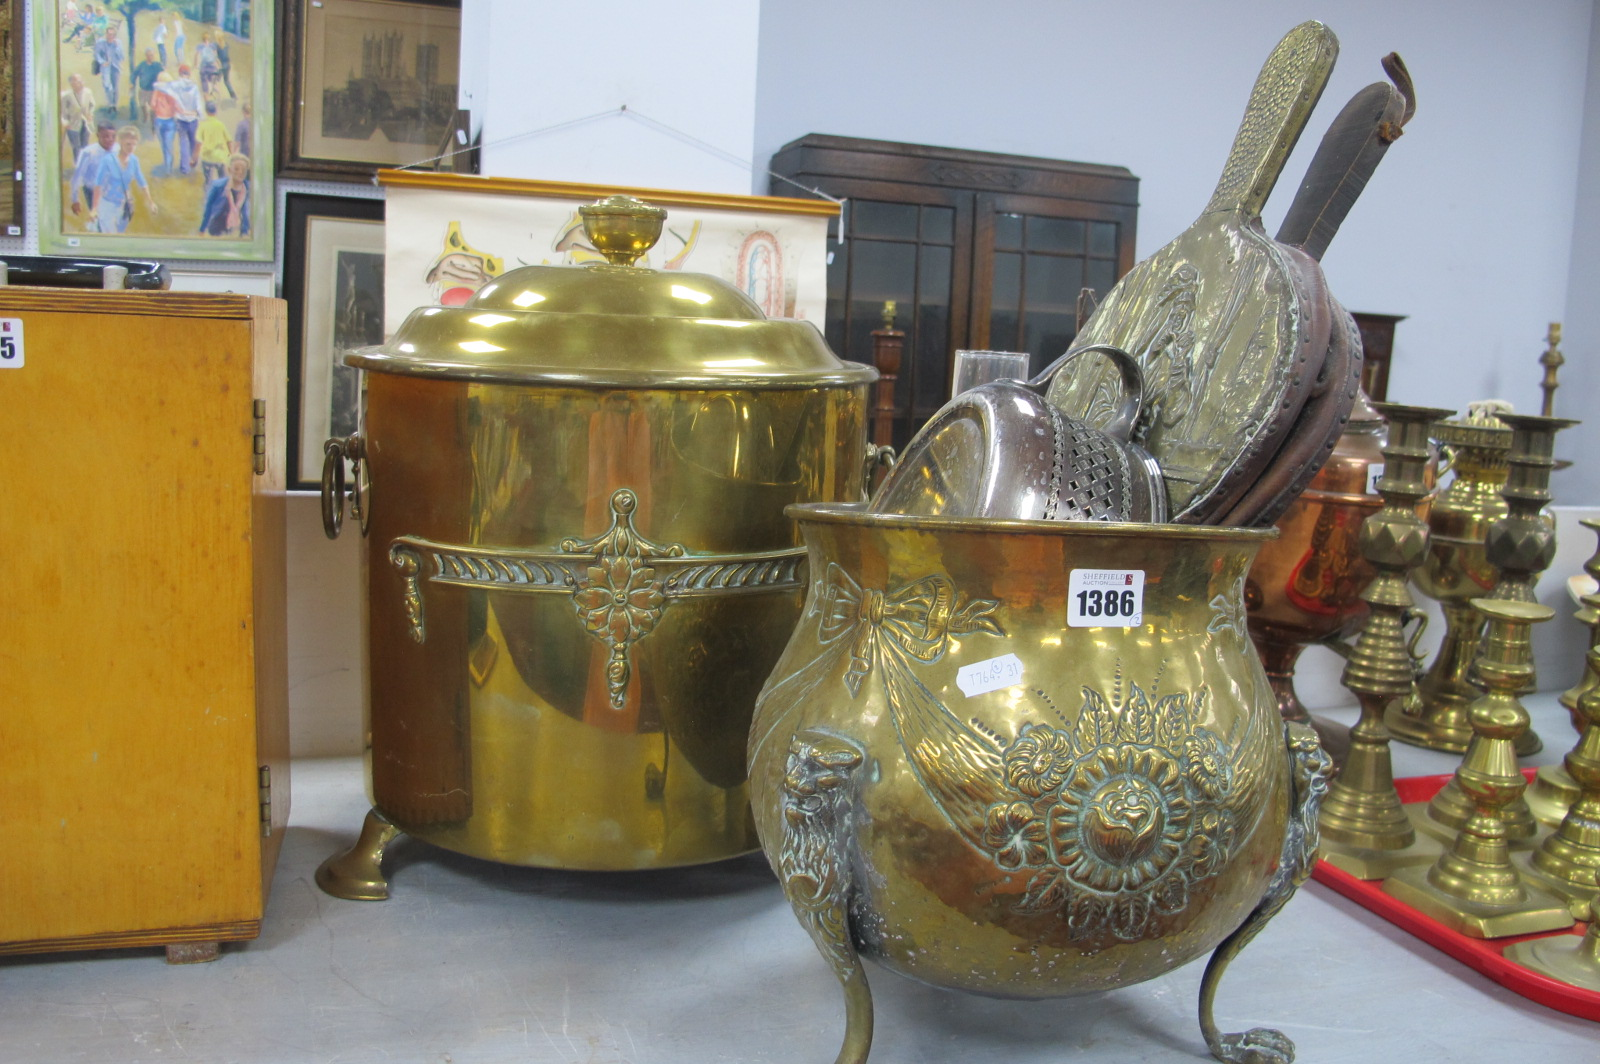 Brass Log Bucket, bellows, jardiniere, comport casserole dish holder.